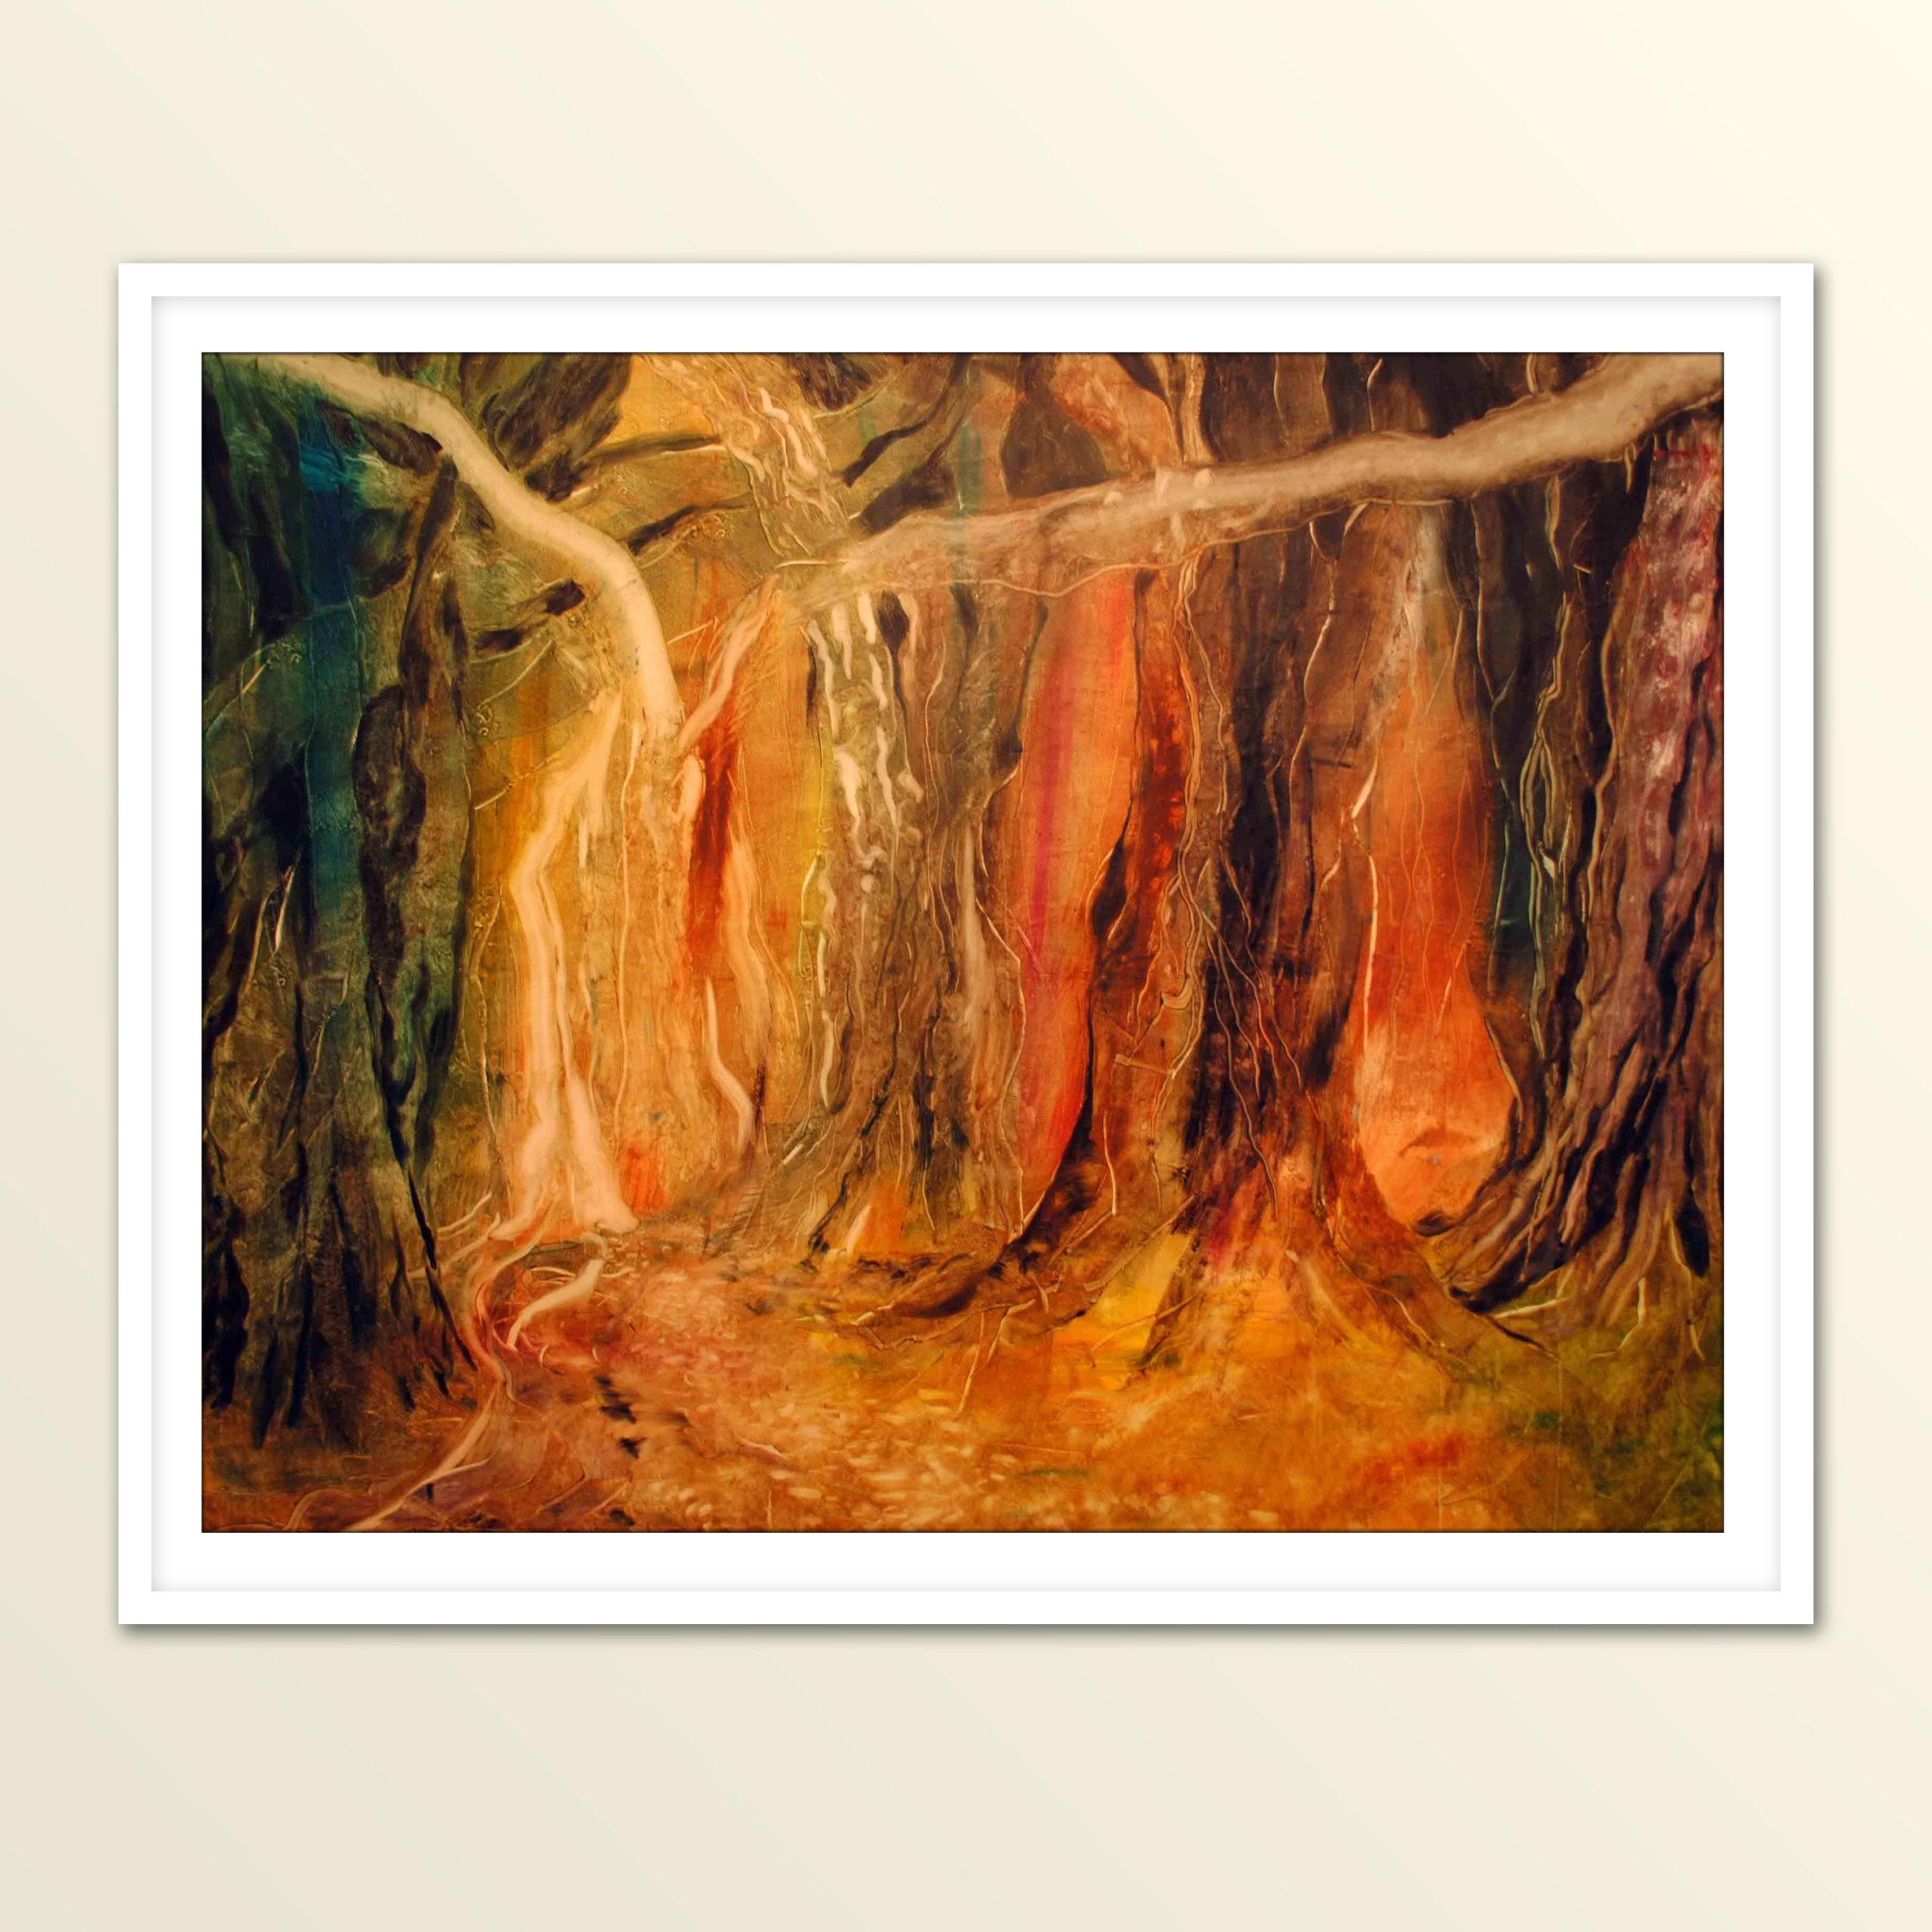 manav gupta, manav, gupta, gupta works, gupta artist, indian art, contemporary art, manav gupta paintings, manav gupta installations, work, works, art, artist, top 10, ten, contemporary, best, of, indian, art,